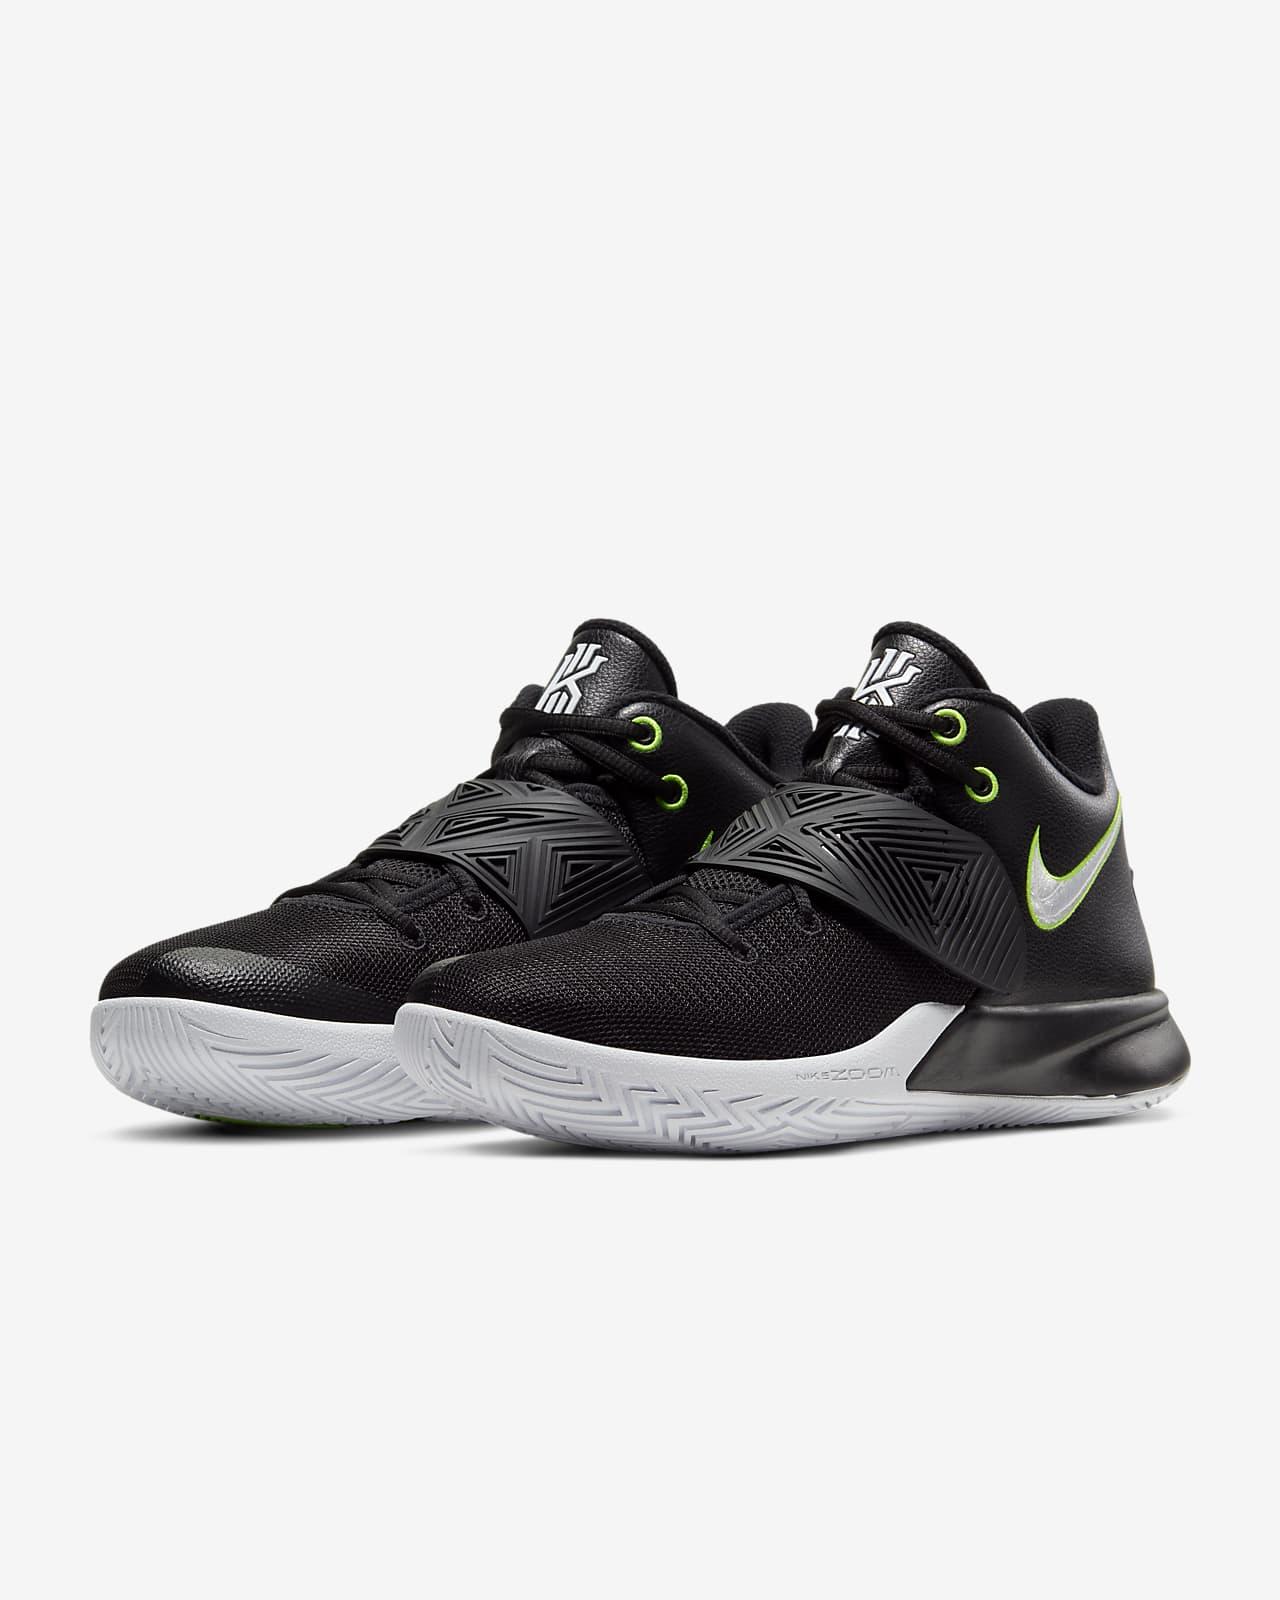 Kyrie Flytrap 3 Basketball Shoe. Nike CA